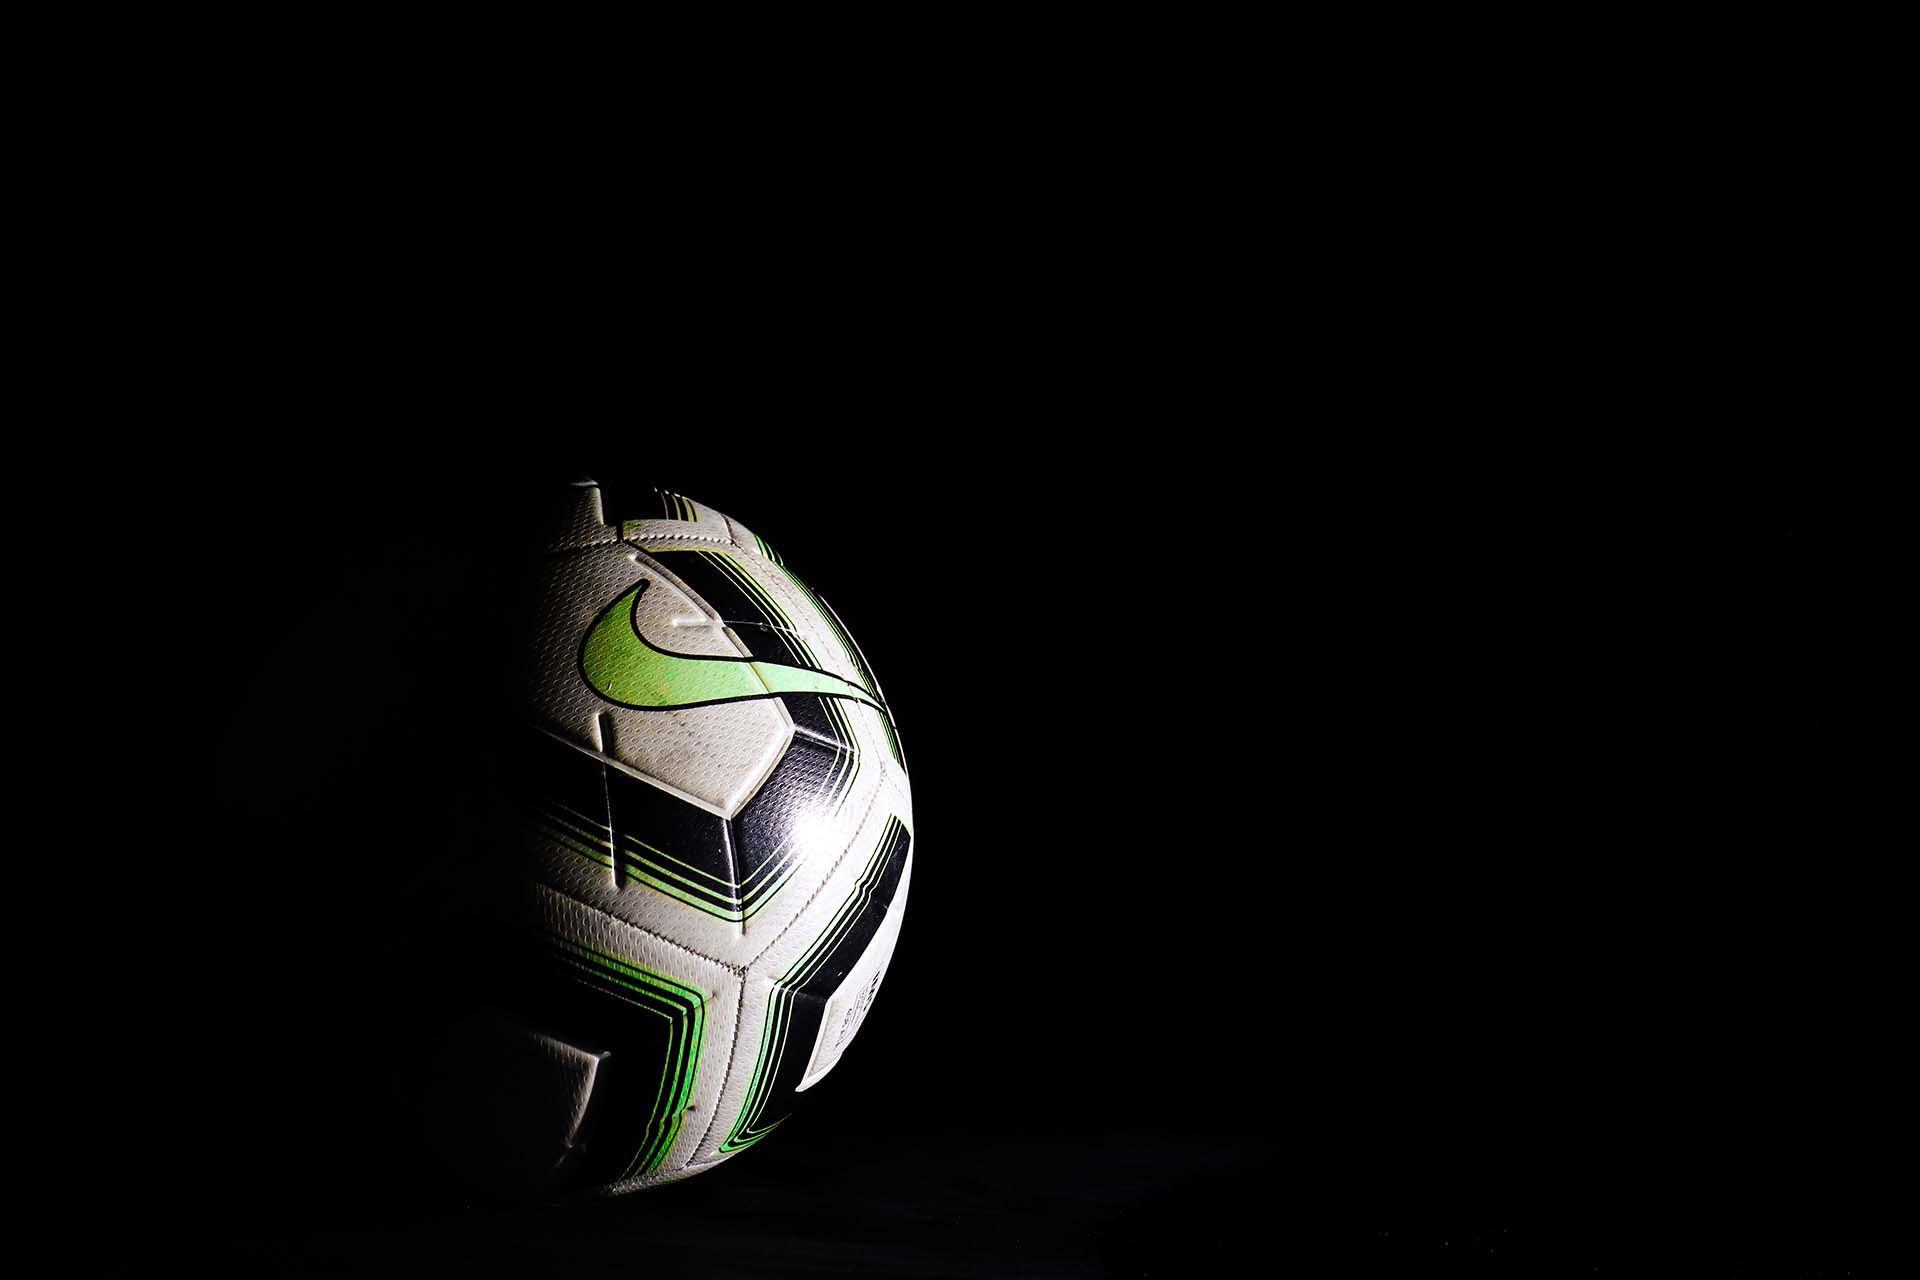 t2informatik Blog: The sports metaphor as motivator